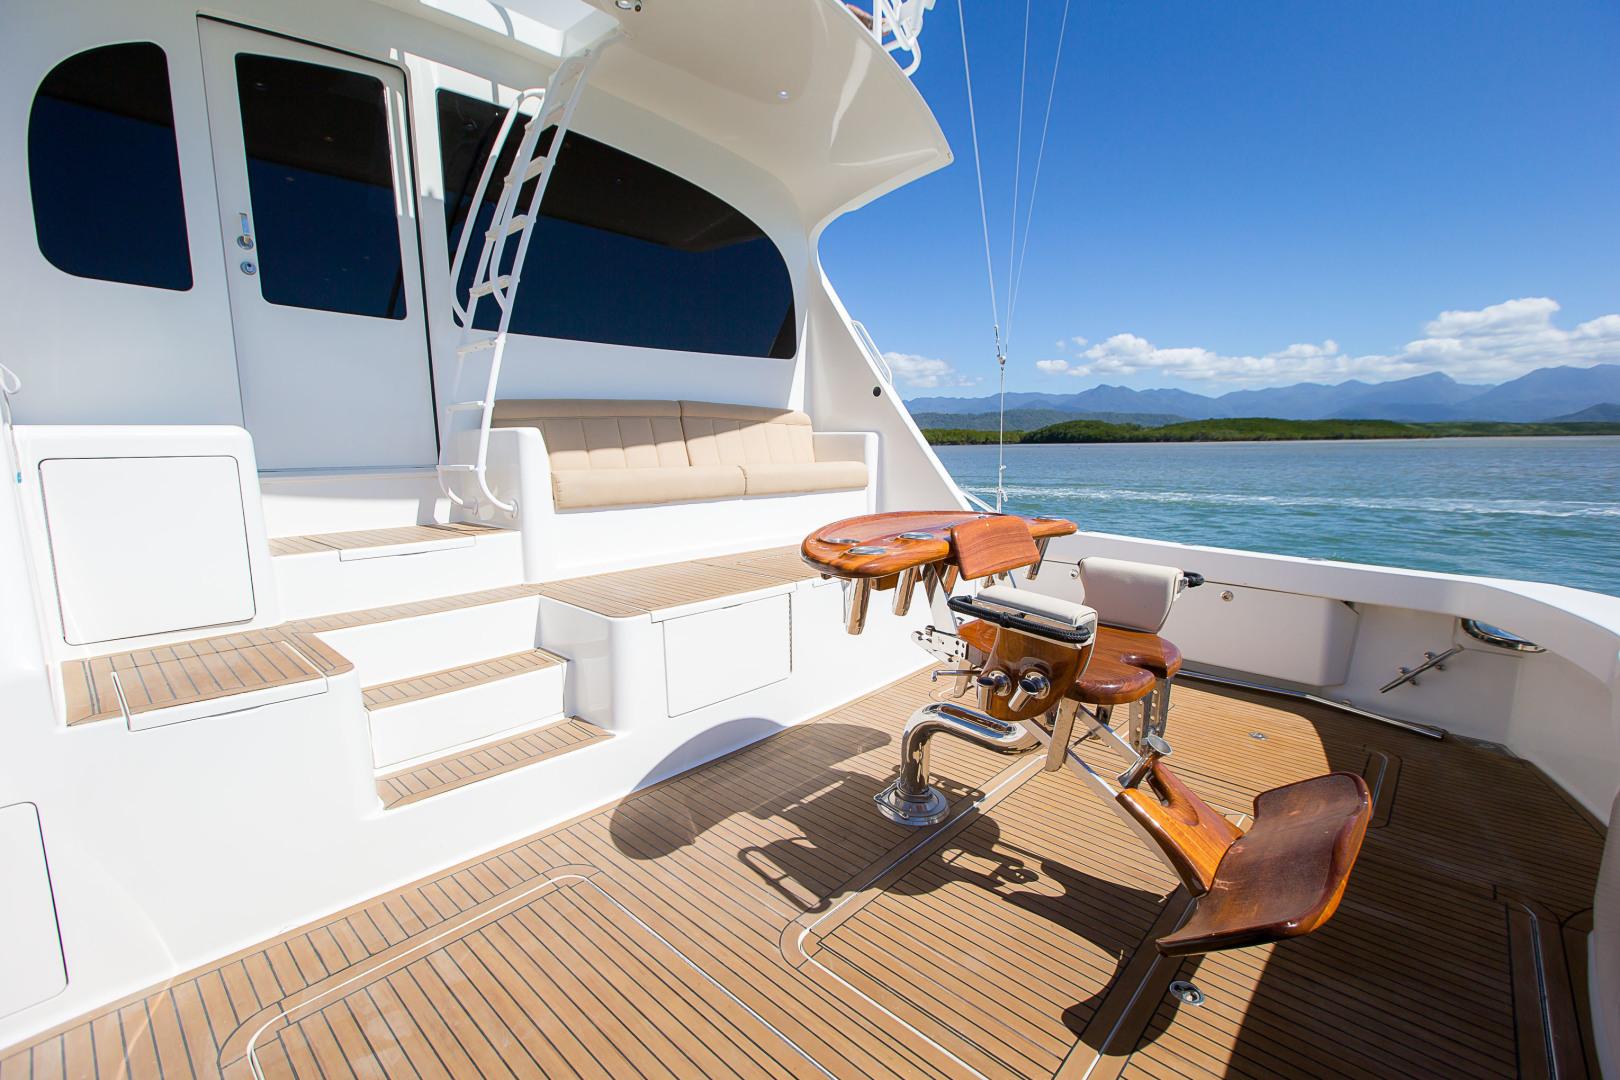 Viking-76 Enclosed Skybridge 2012-Reel Power Palm Beach-Florida-United States-1346553   Thumbnail